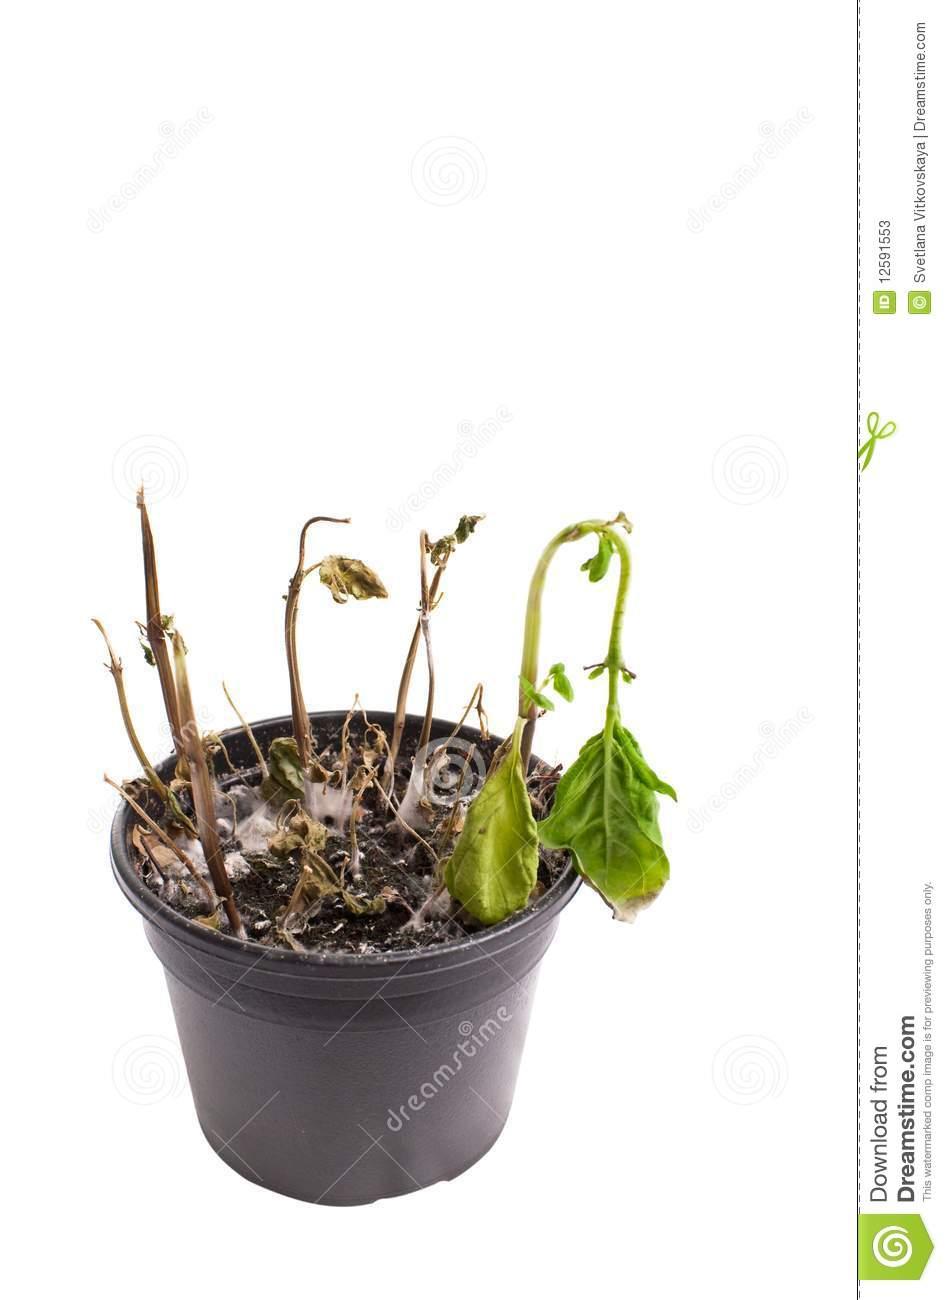 Dead Plant Clipart - Clipart Kid